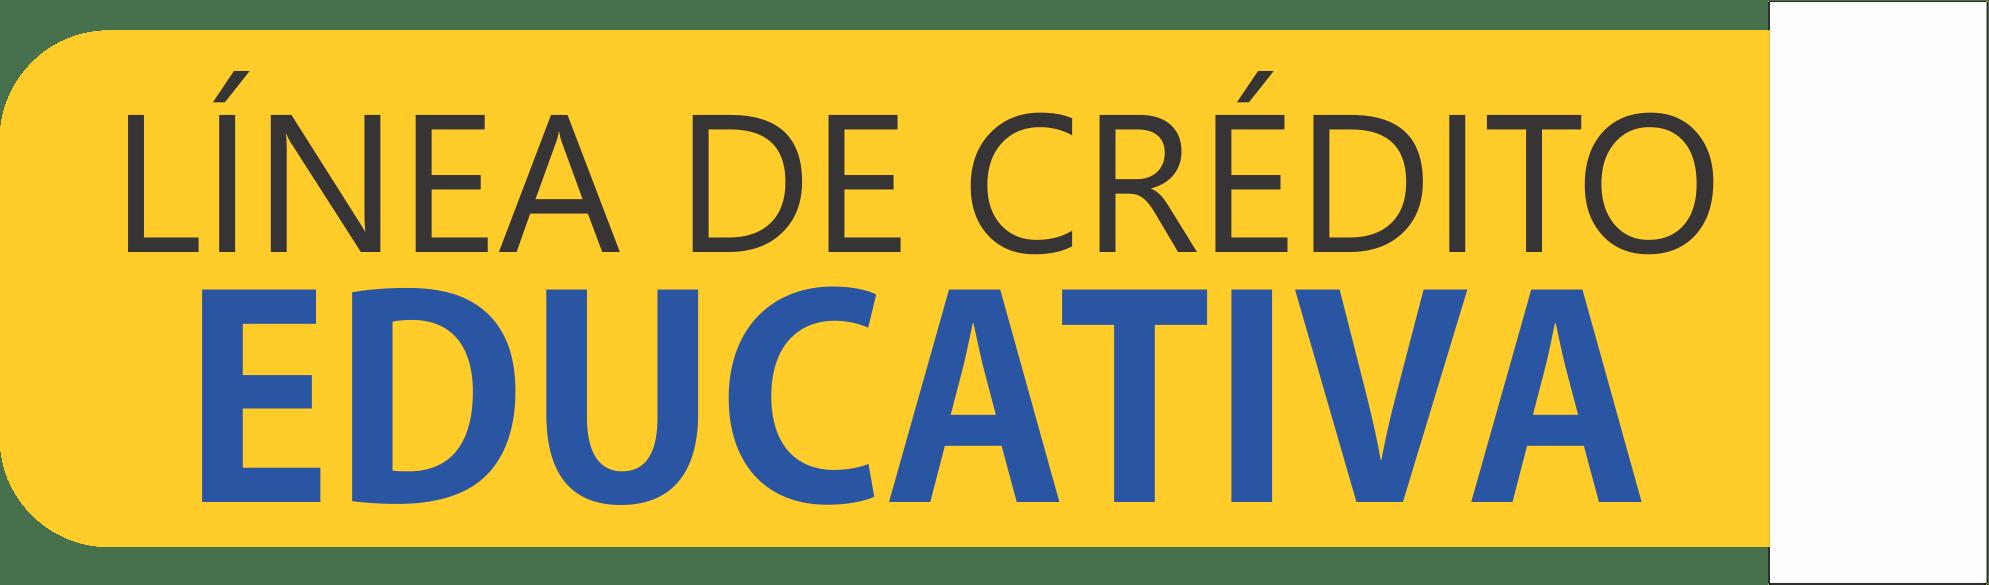 banner línea de crédito educativa